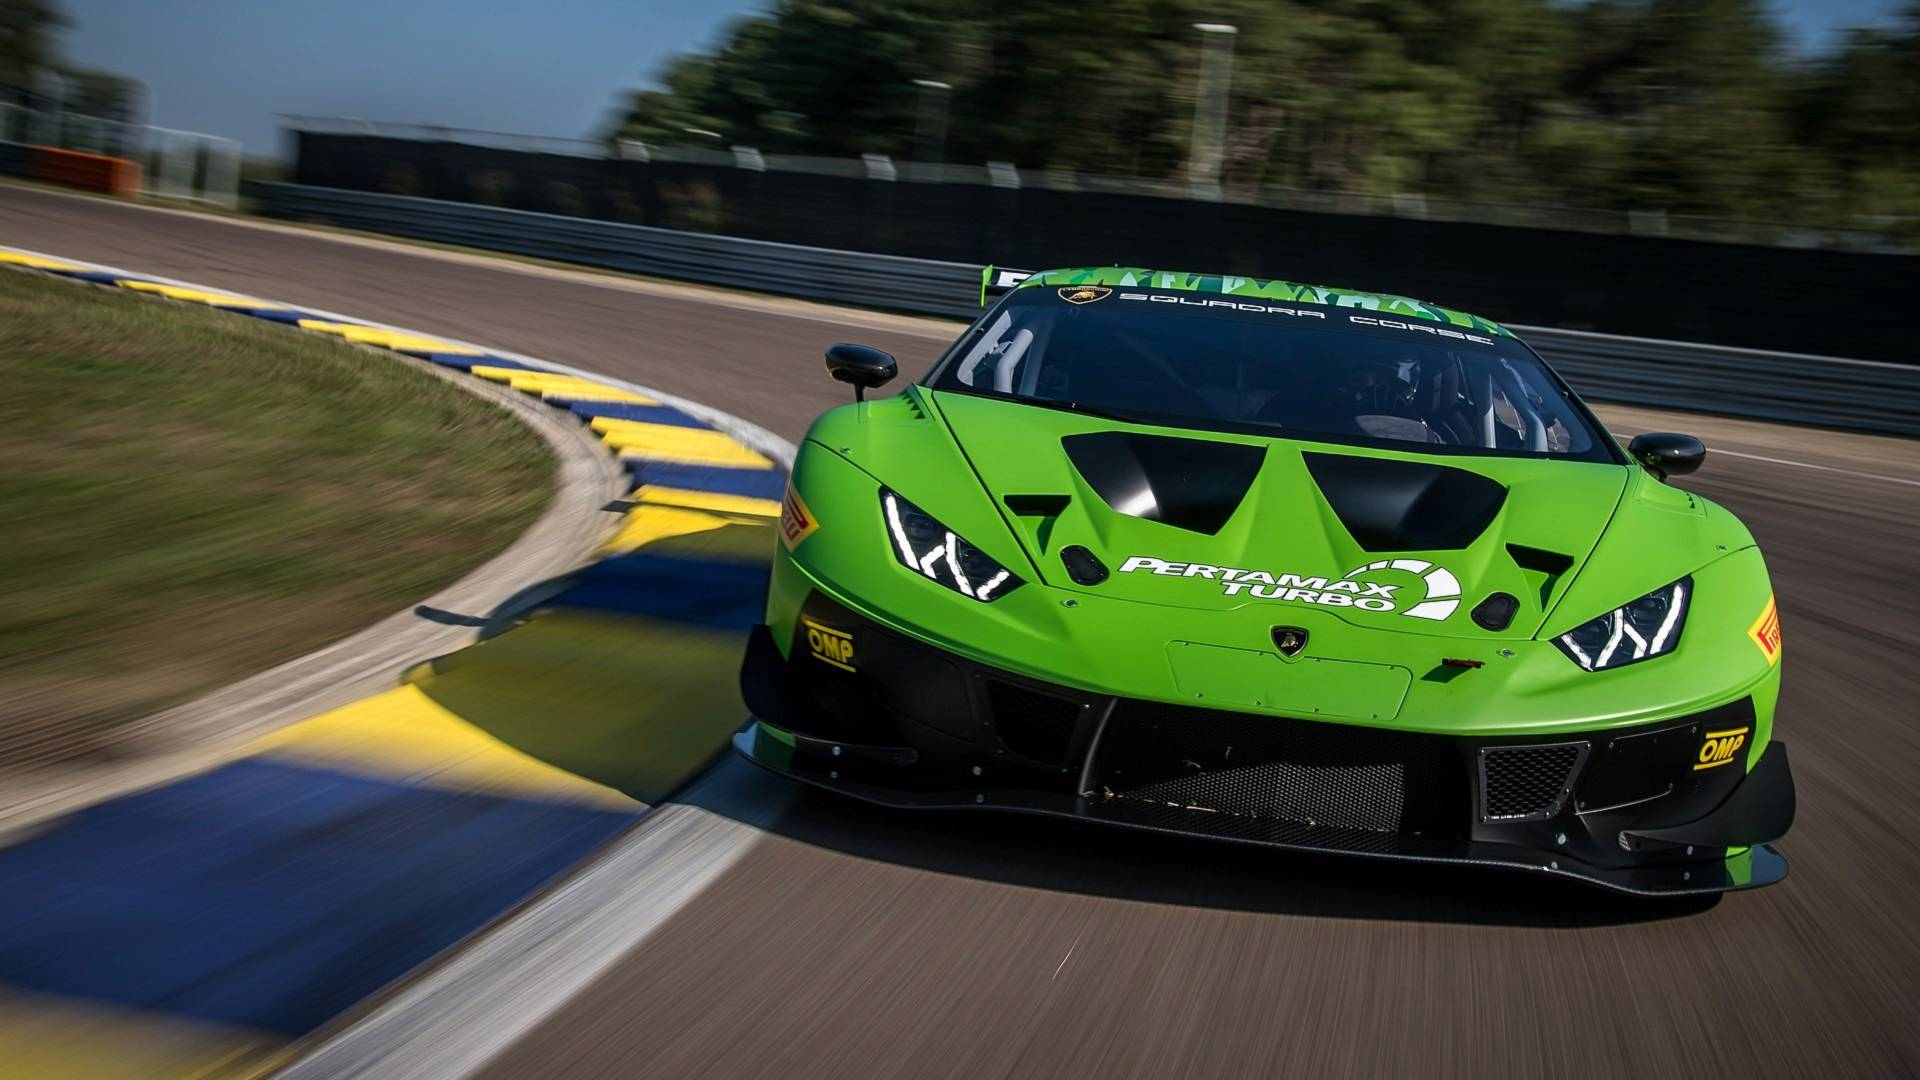 Lamborghini представила обновленное купе Huracan GT3 Evo